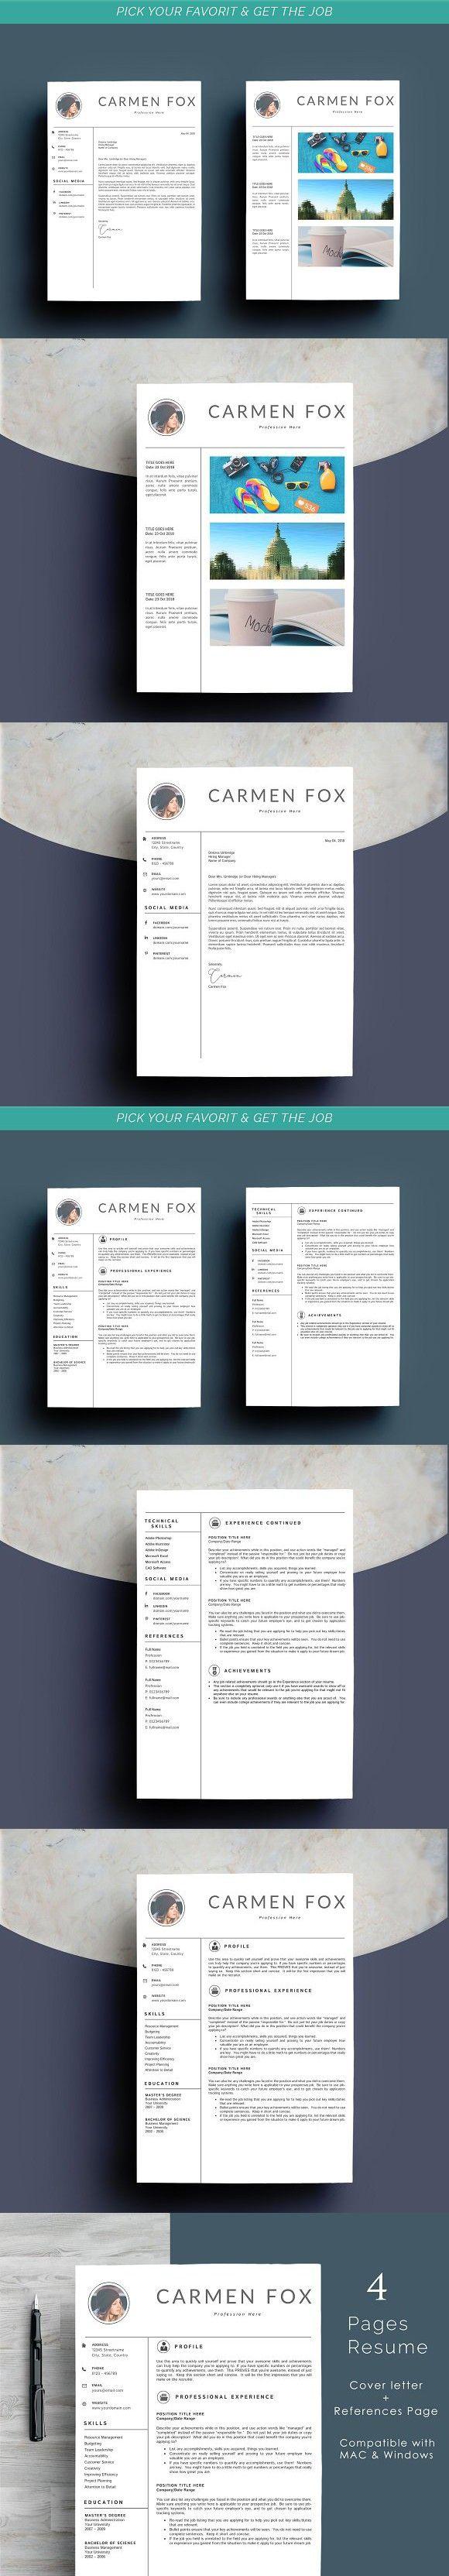 Item analysis summary report staar released